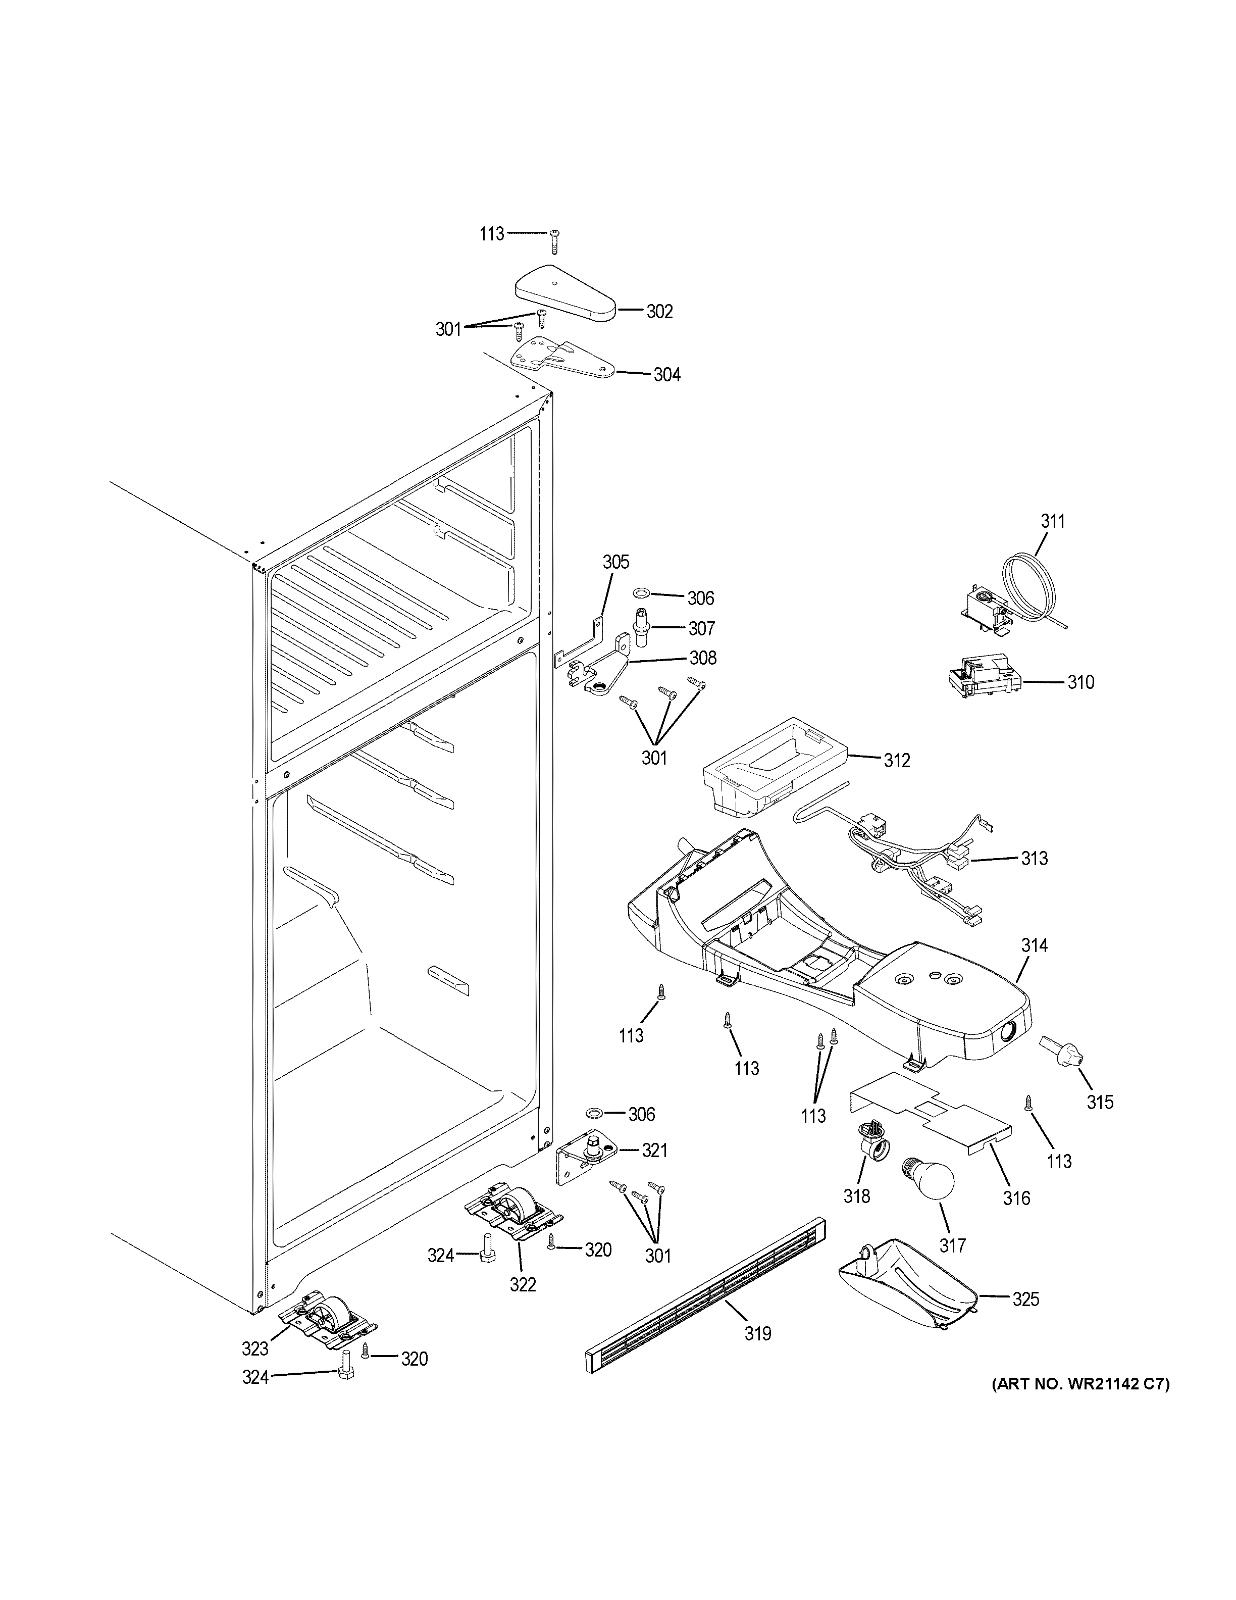 GE Refrigerator : Temperature Control Light Cover